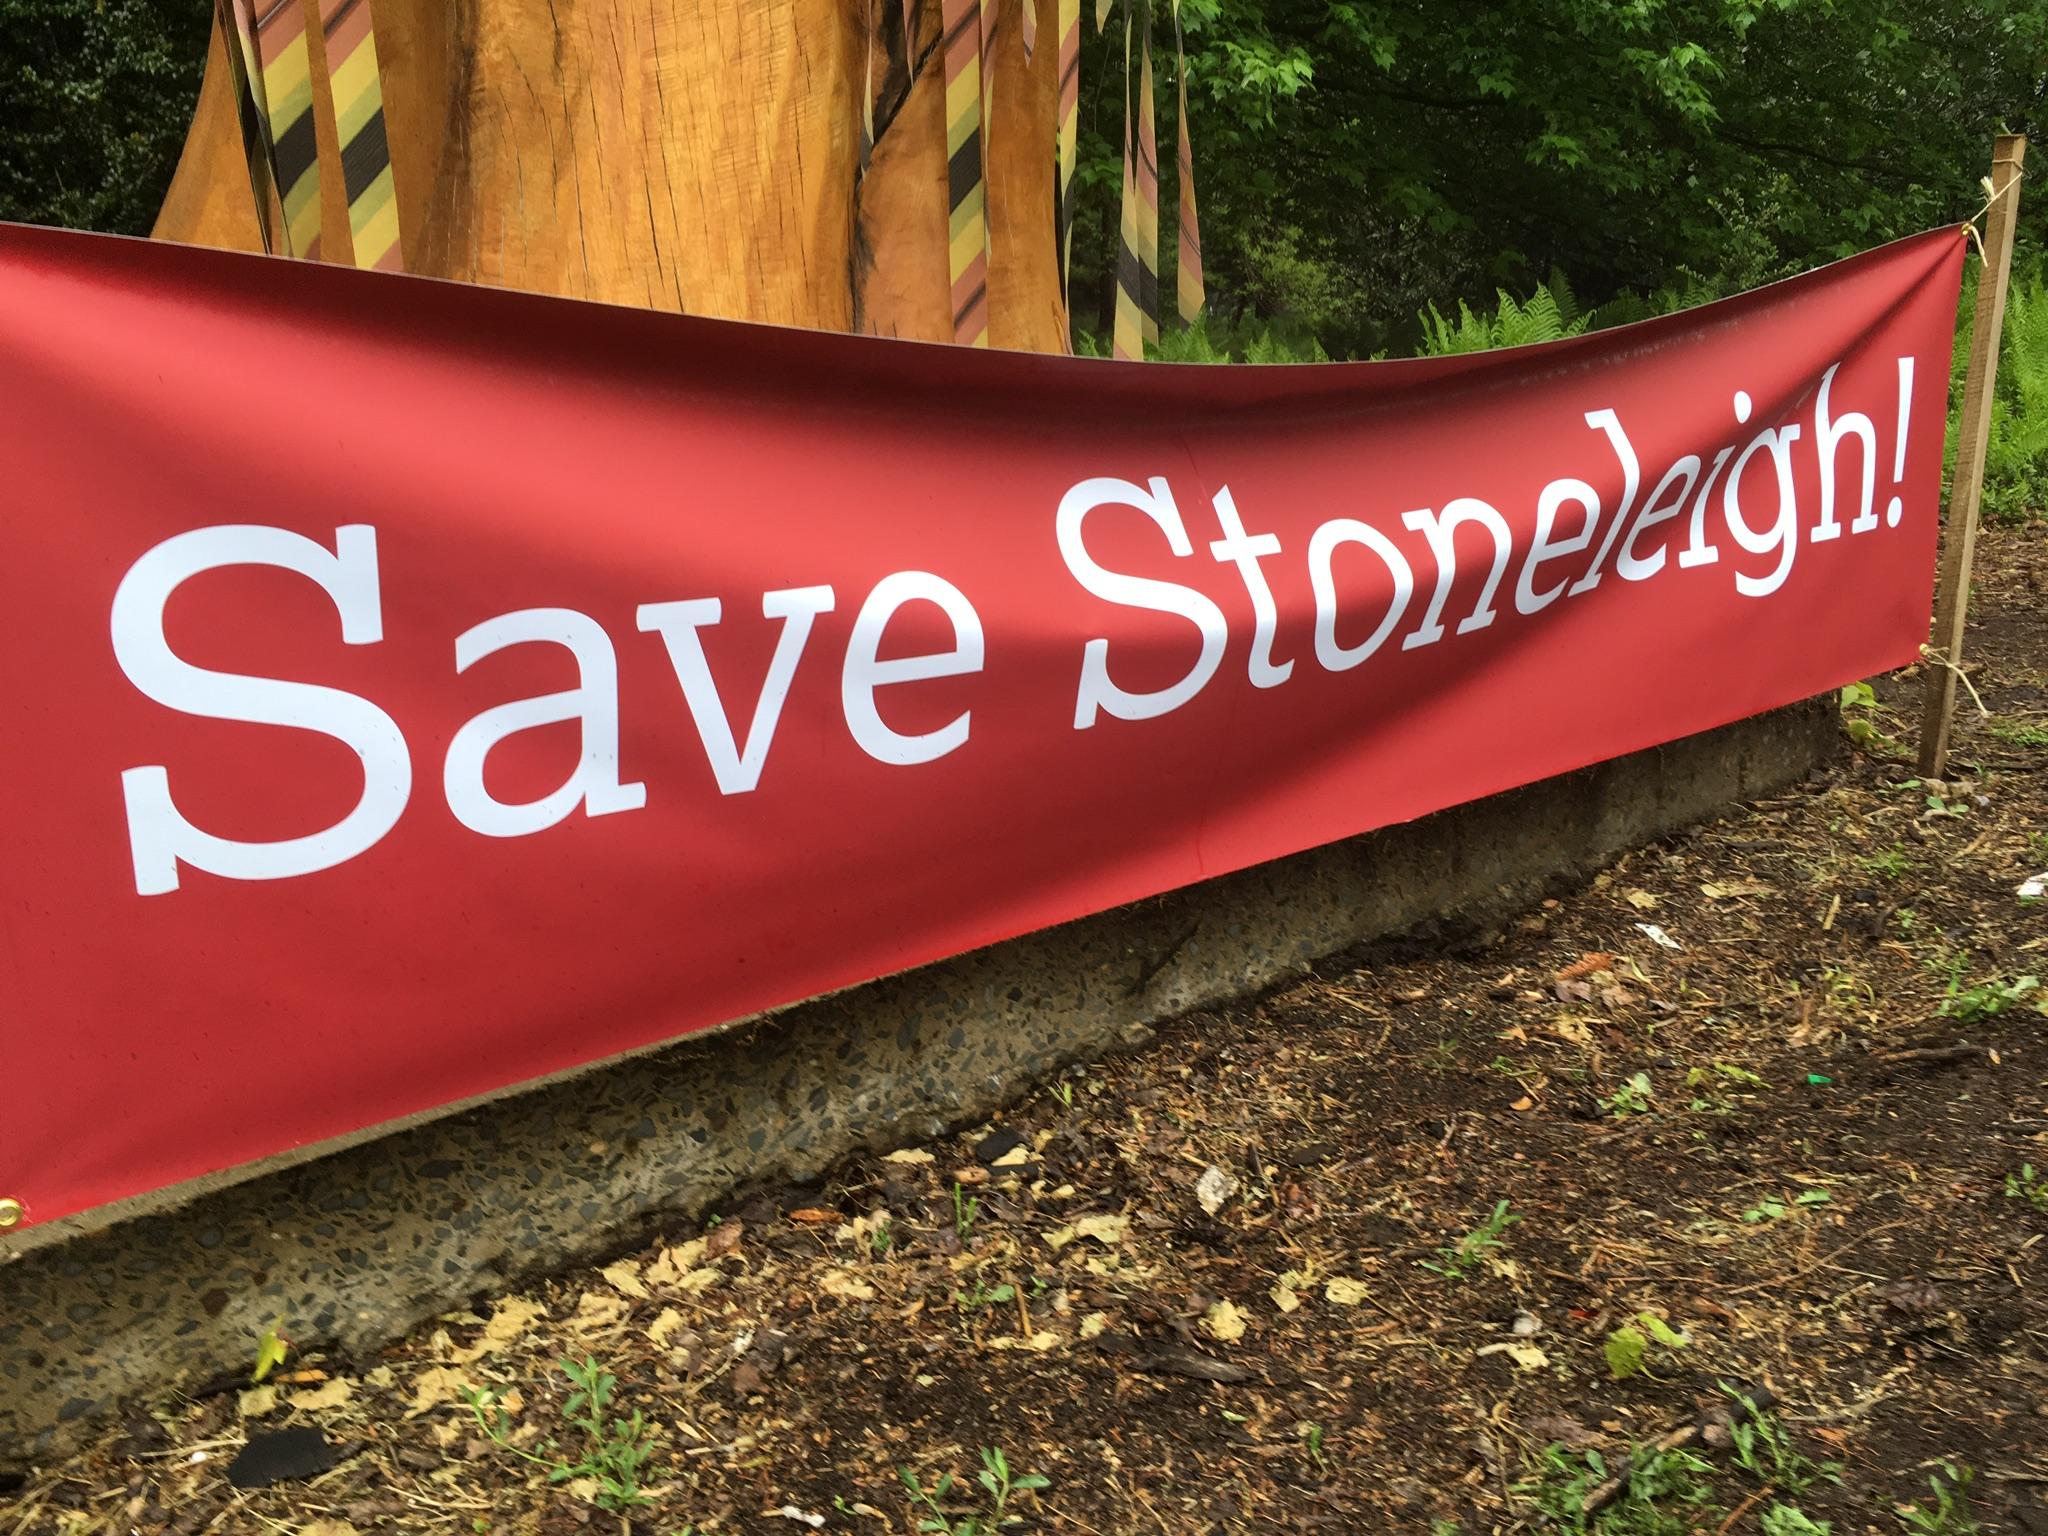 Save Stoneleigh Banner